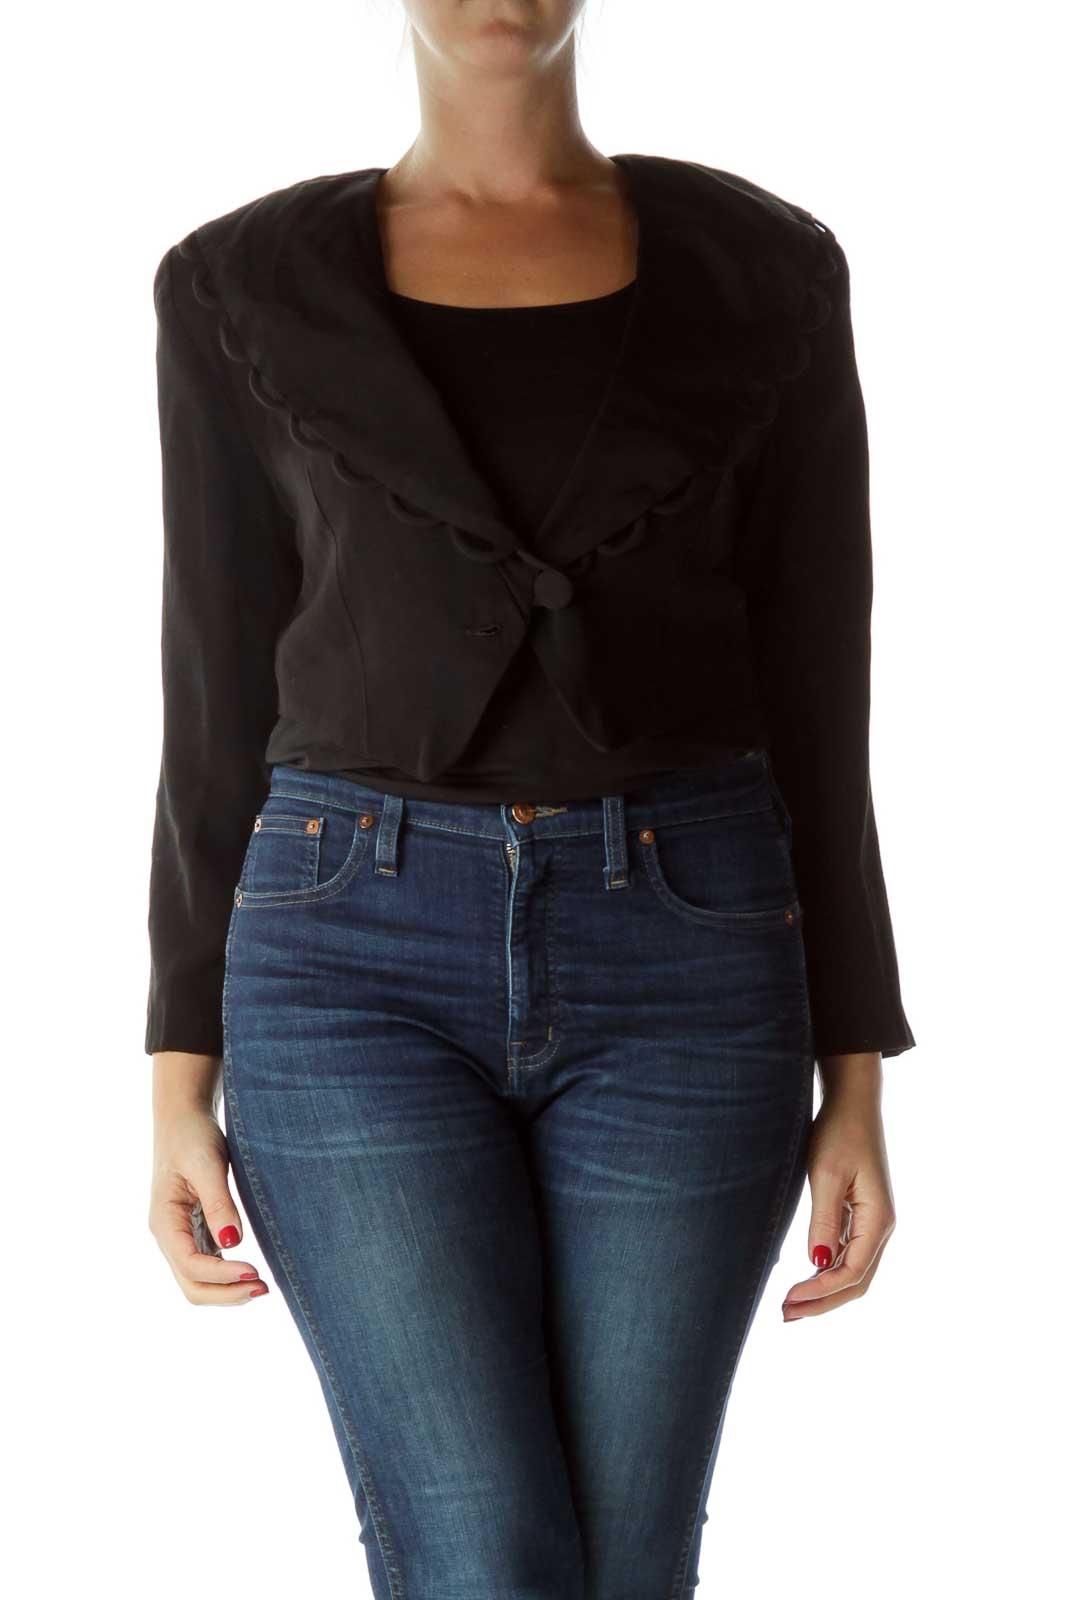 Black Cropped Jacket with Shoulder Pads